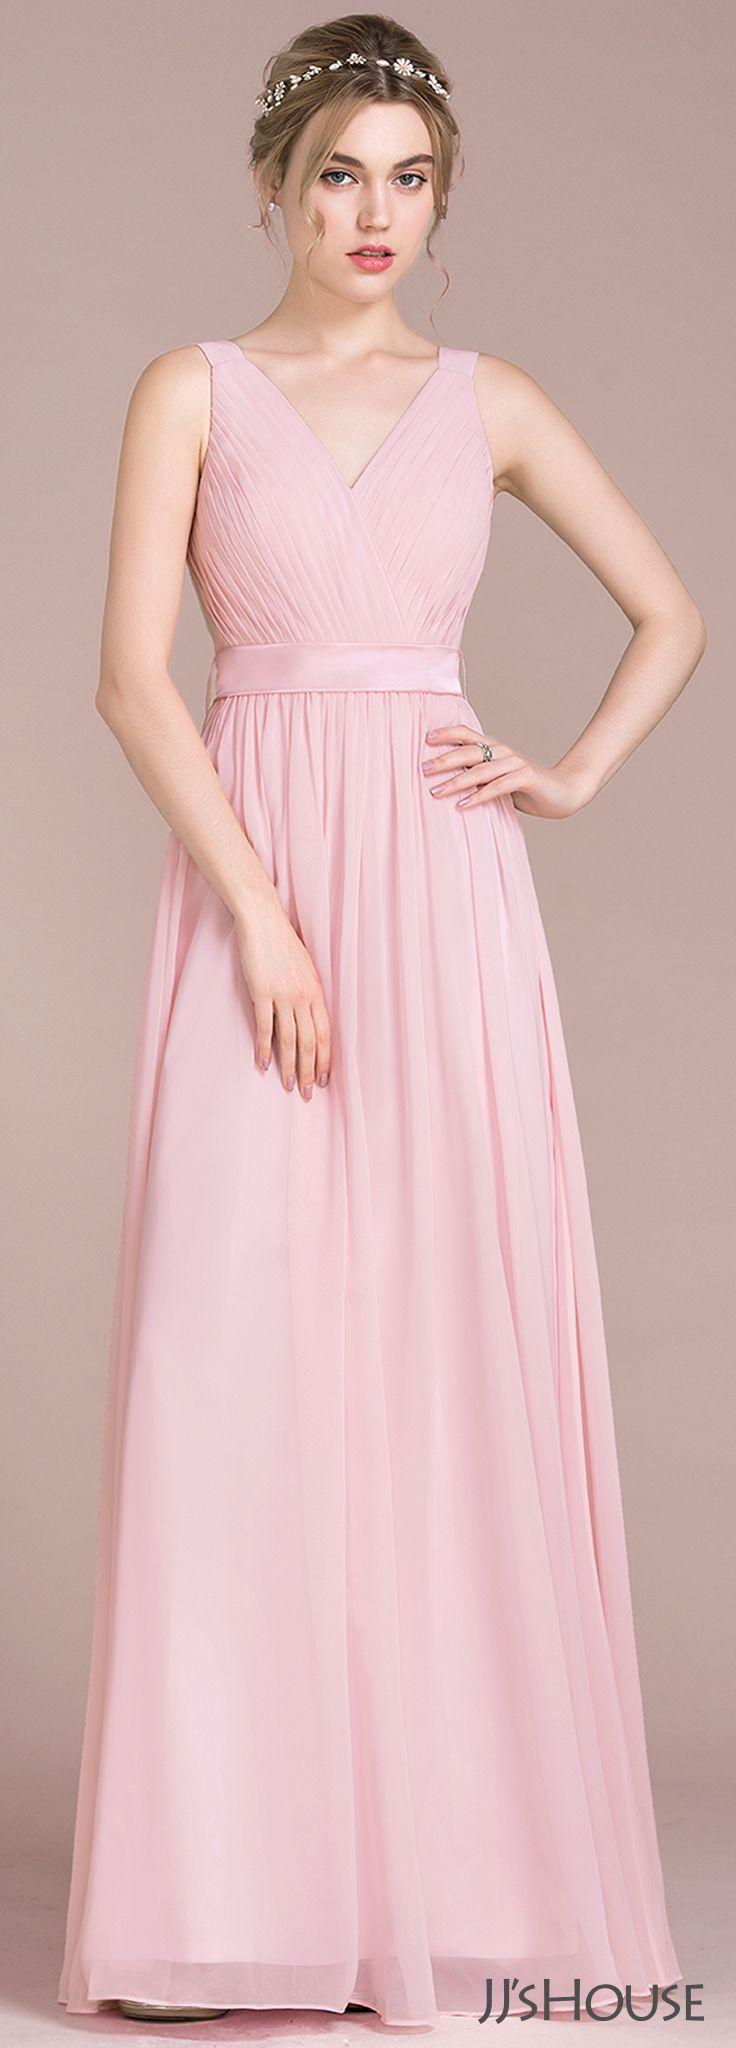 JJsHouse #Bridesmaid | MC | Pinterest | Vestiditos, Vestidos de dama ...